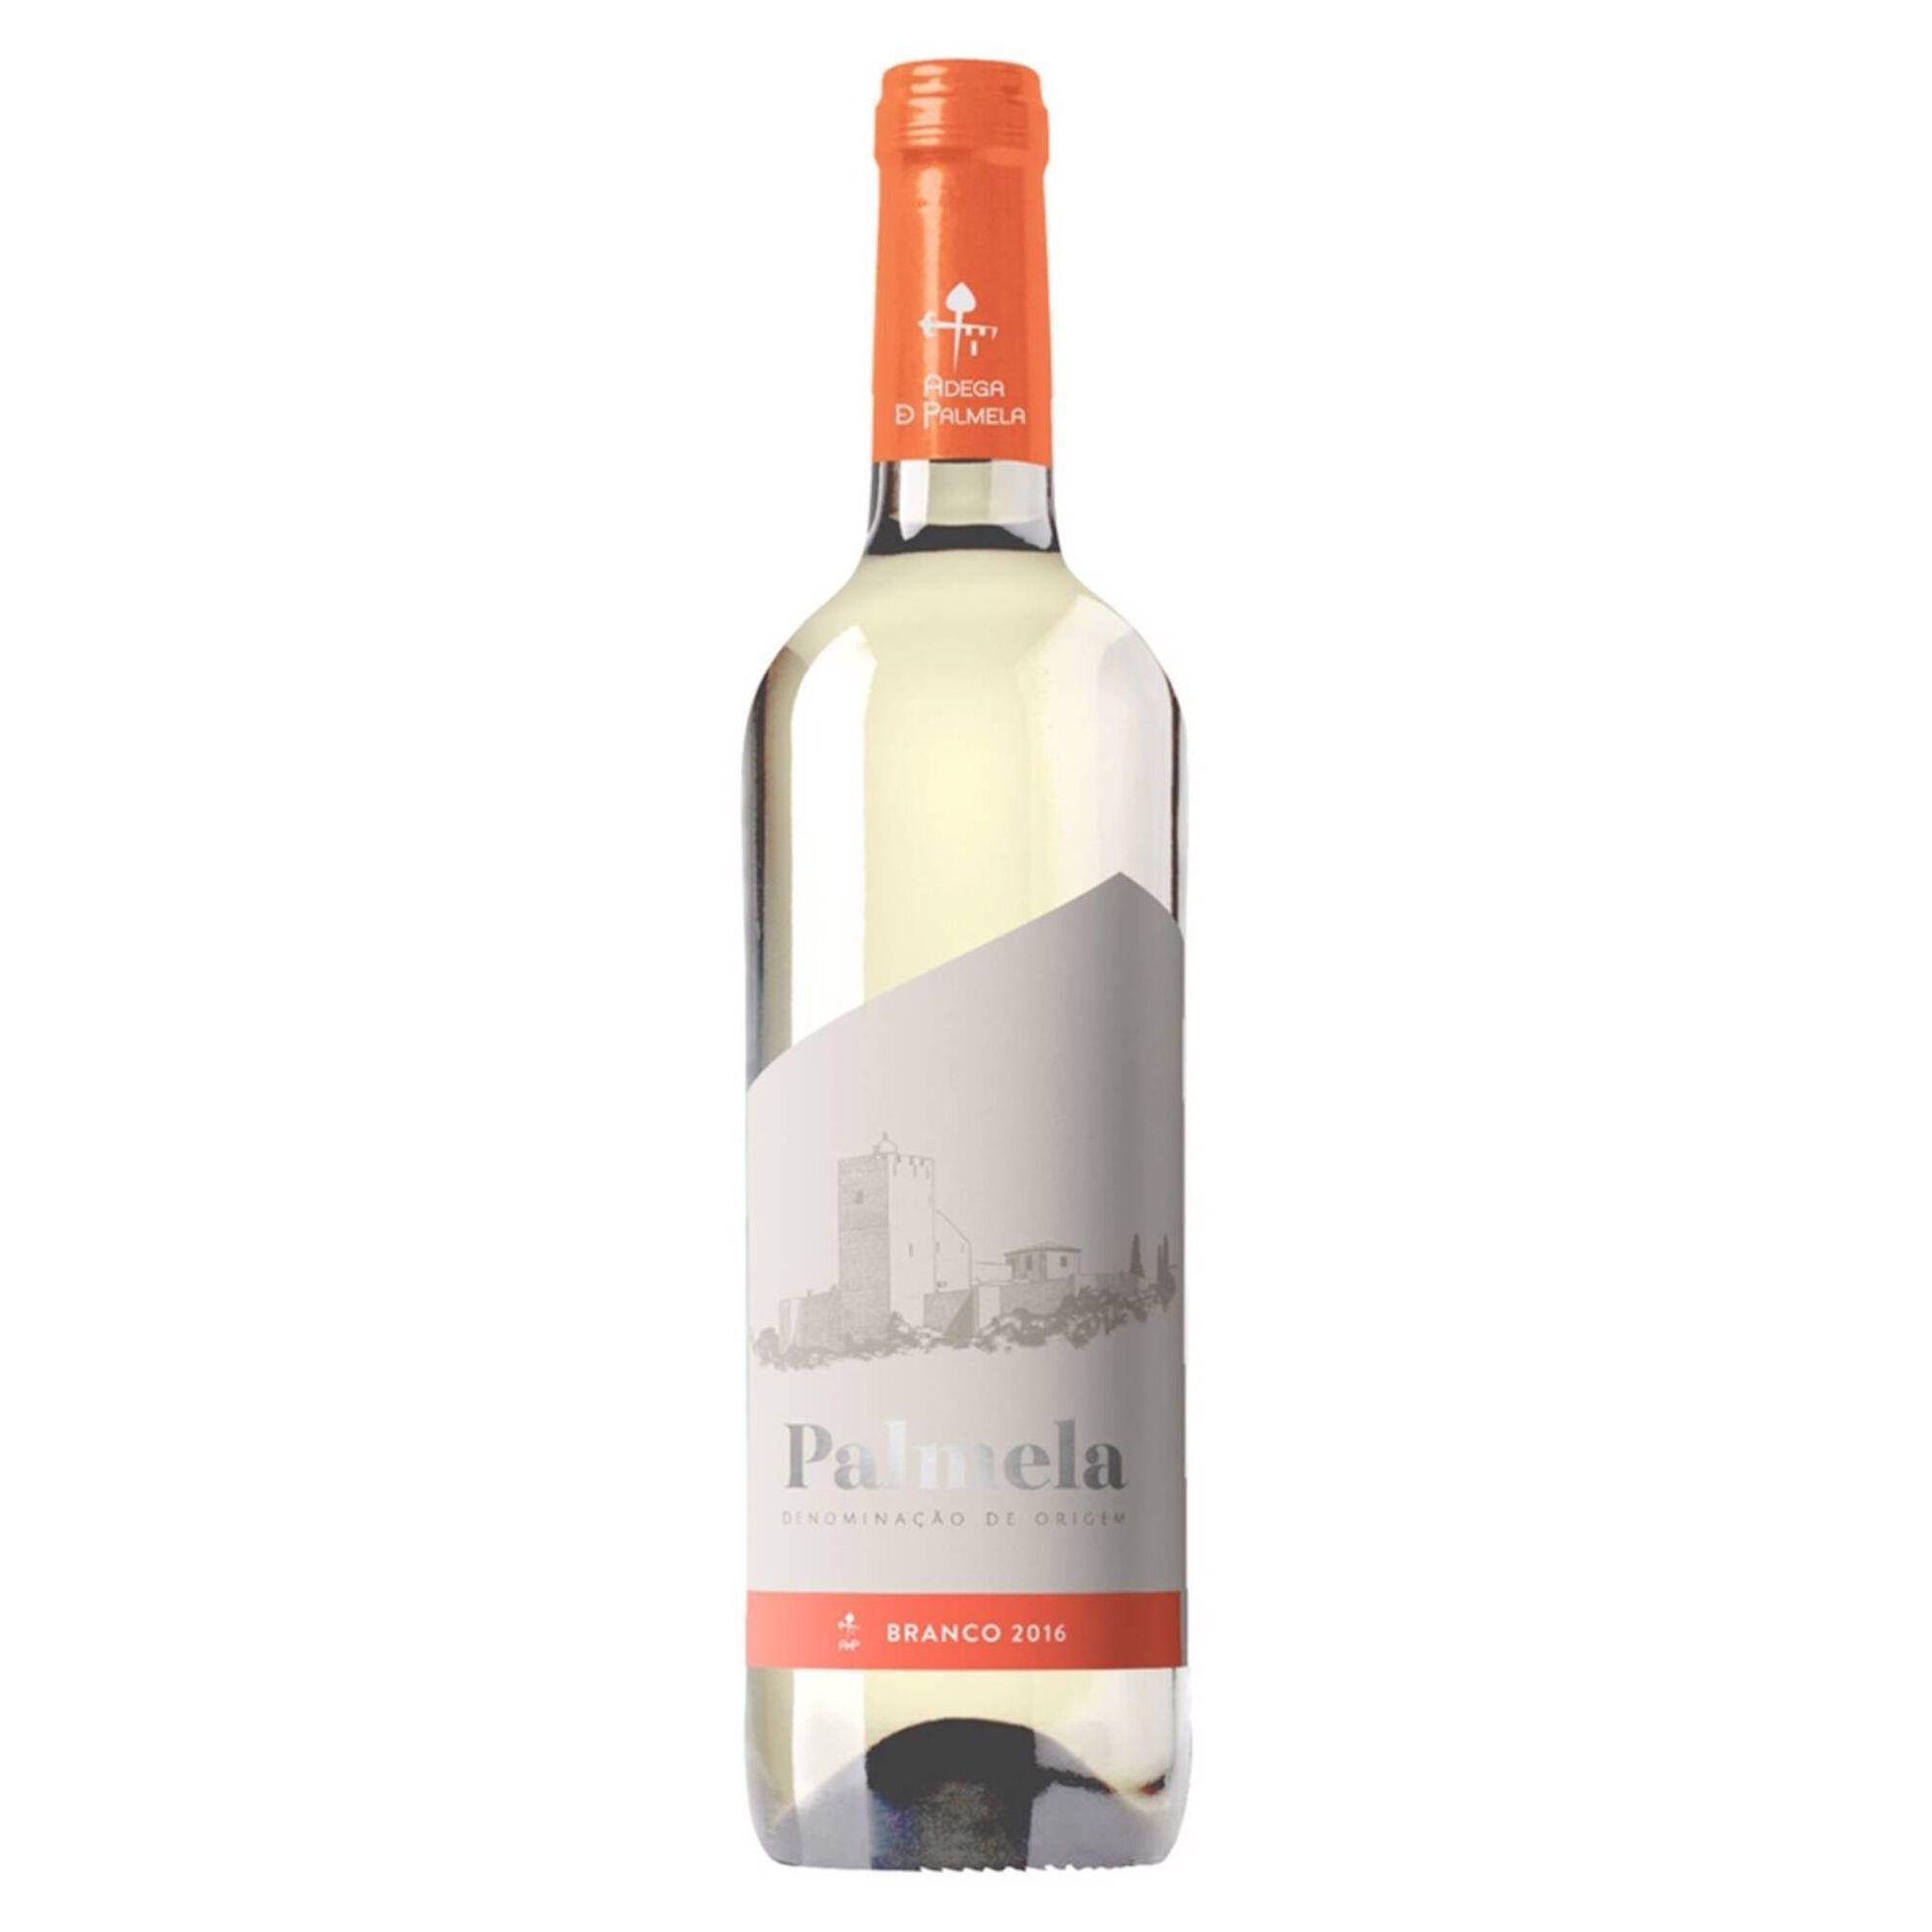 Palmela DOC Palmela Vinho Branco